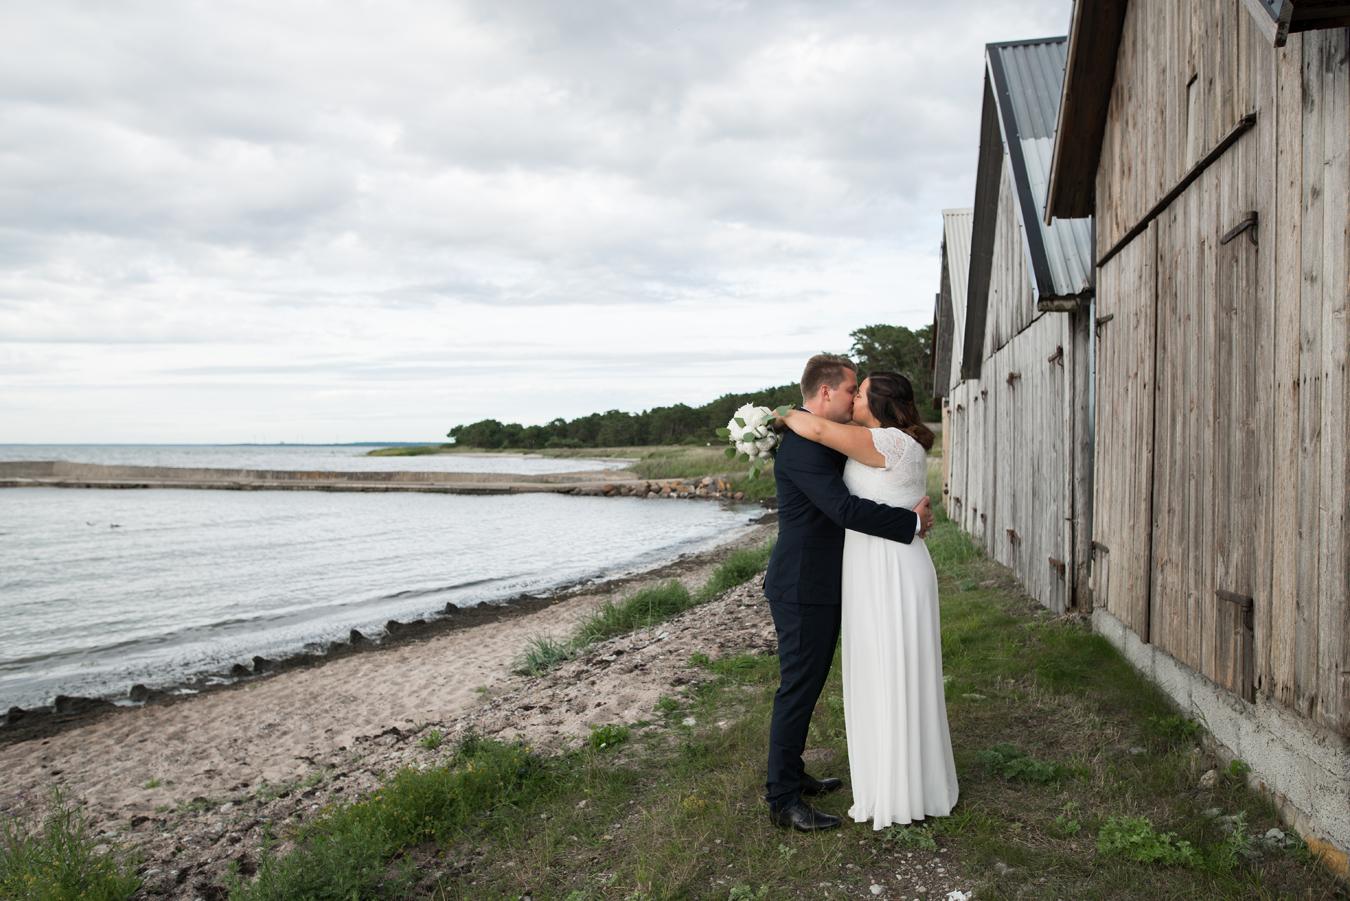 108-bröllopsfotograf-gotland-ekstakusten-neas-fotografi.jpg